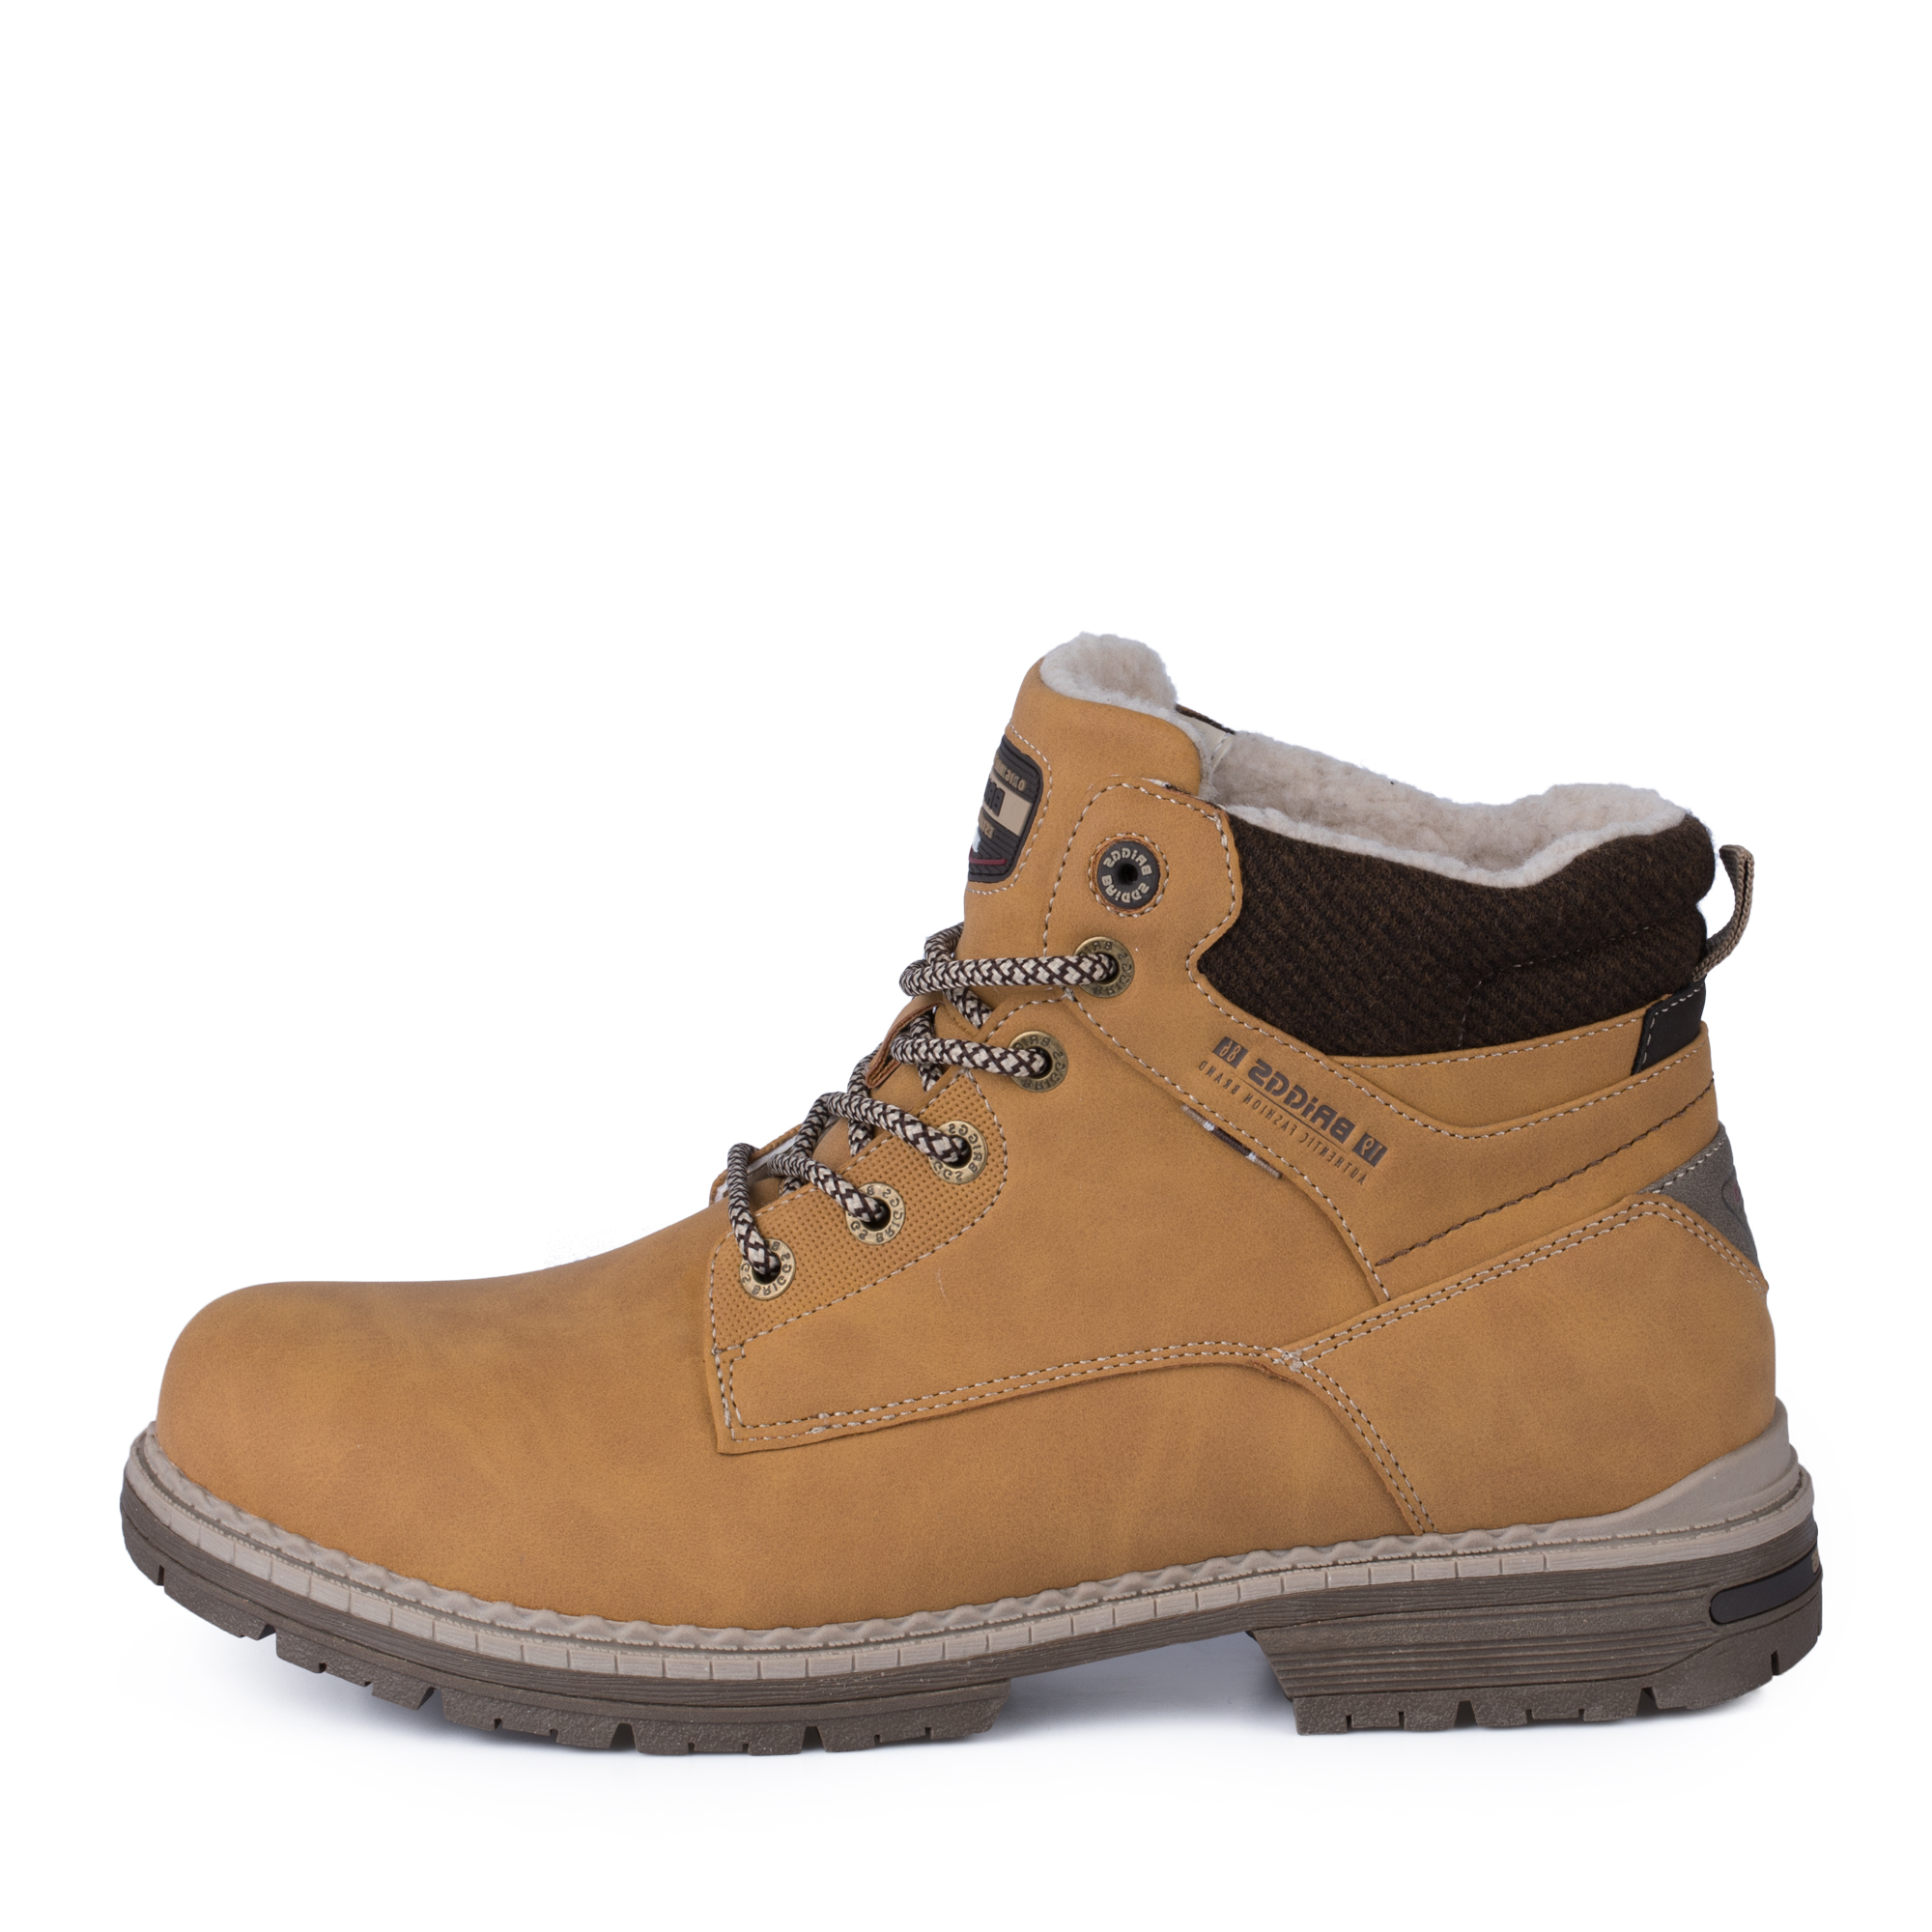 Ботинки BRIGGS 018-104B-4618